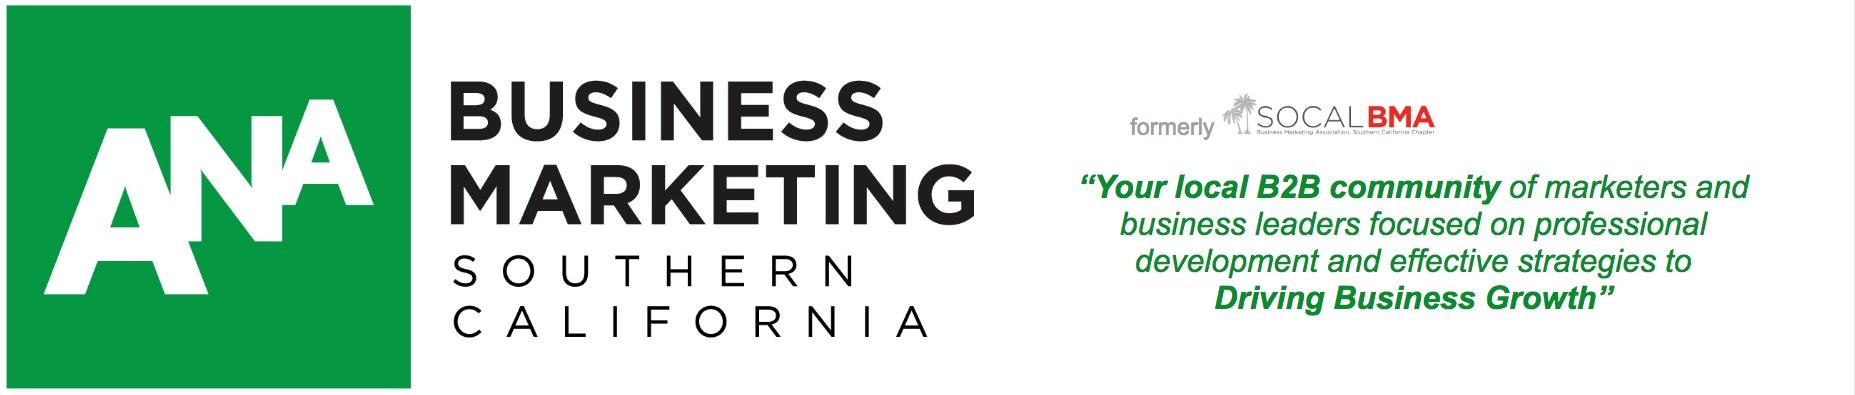 Business Marketing Association, Southern California Chapter